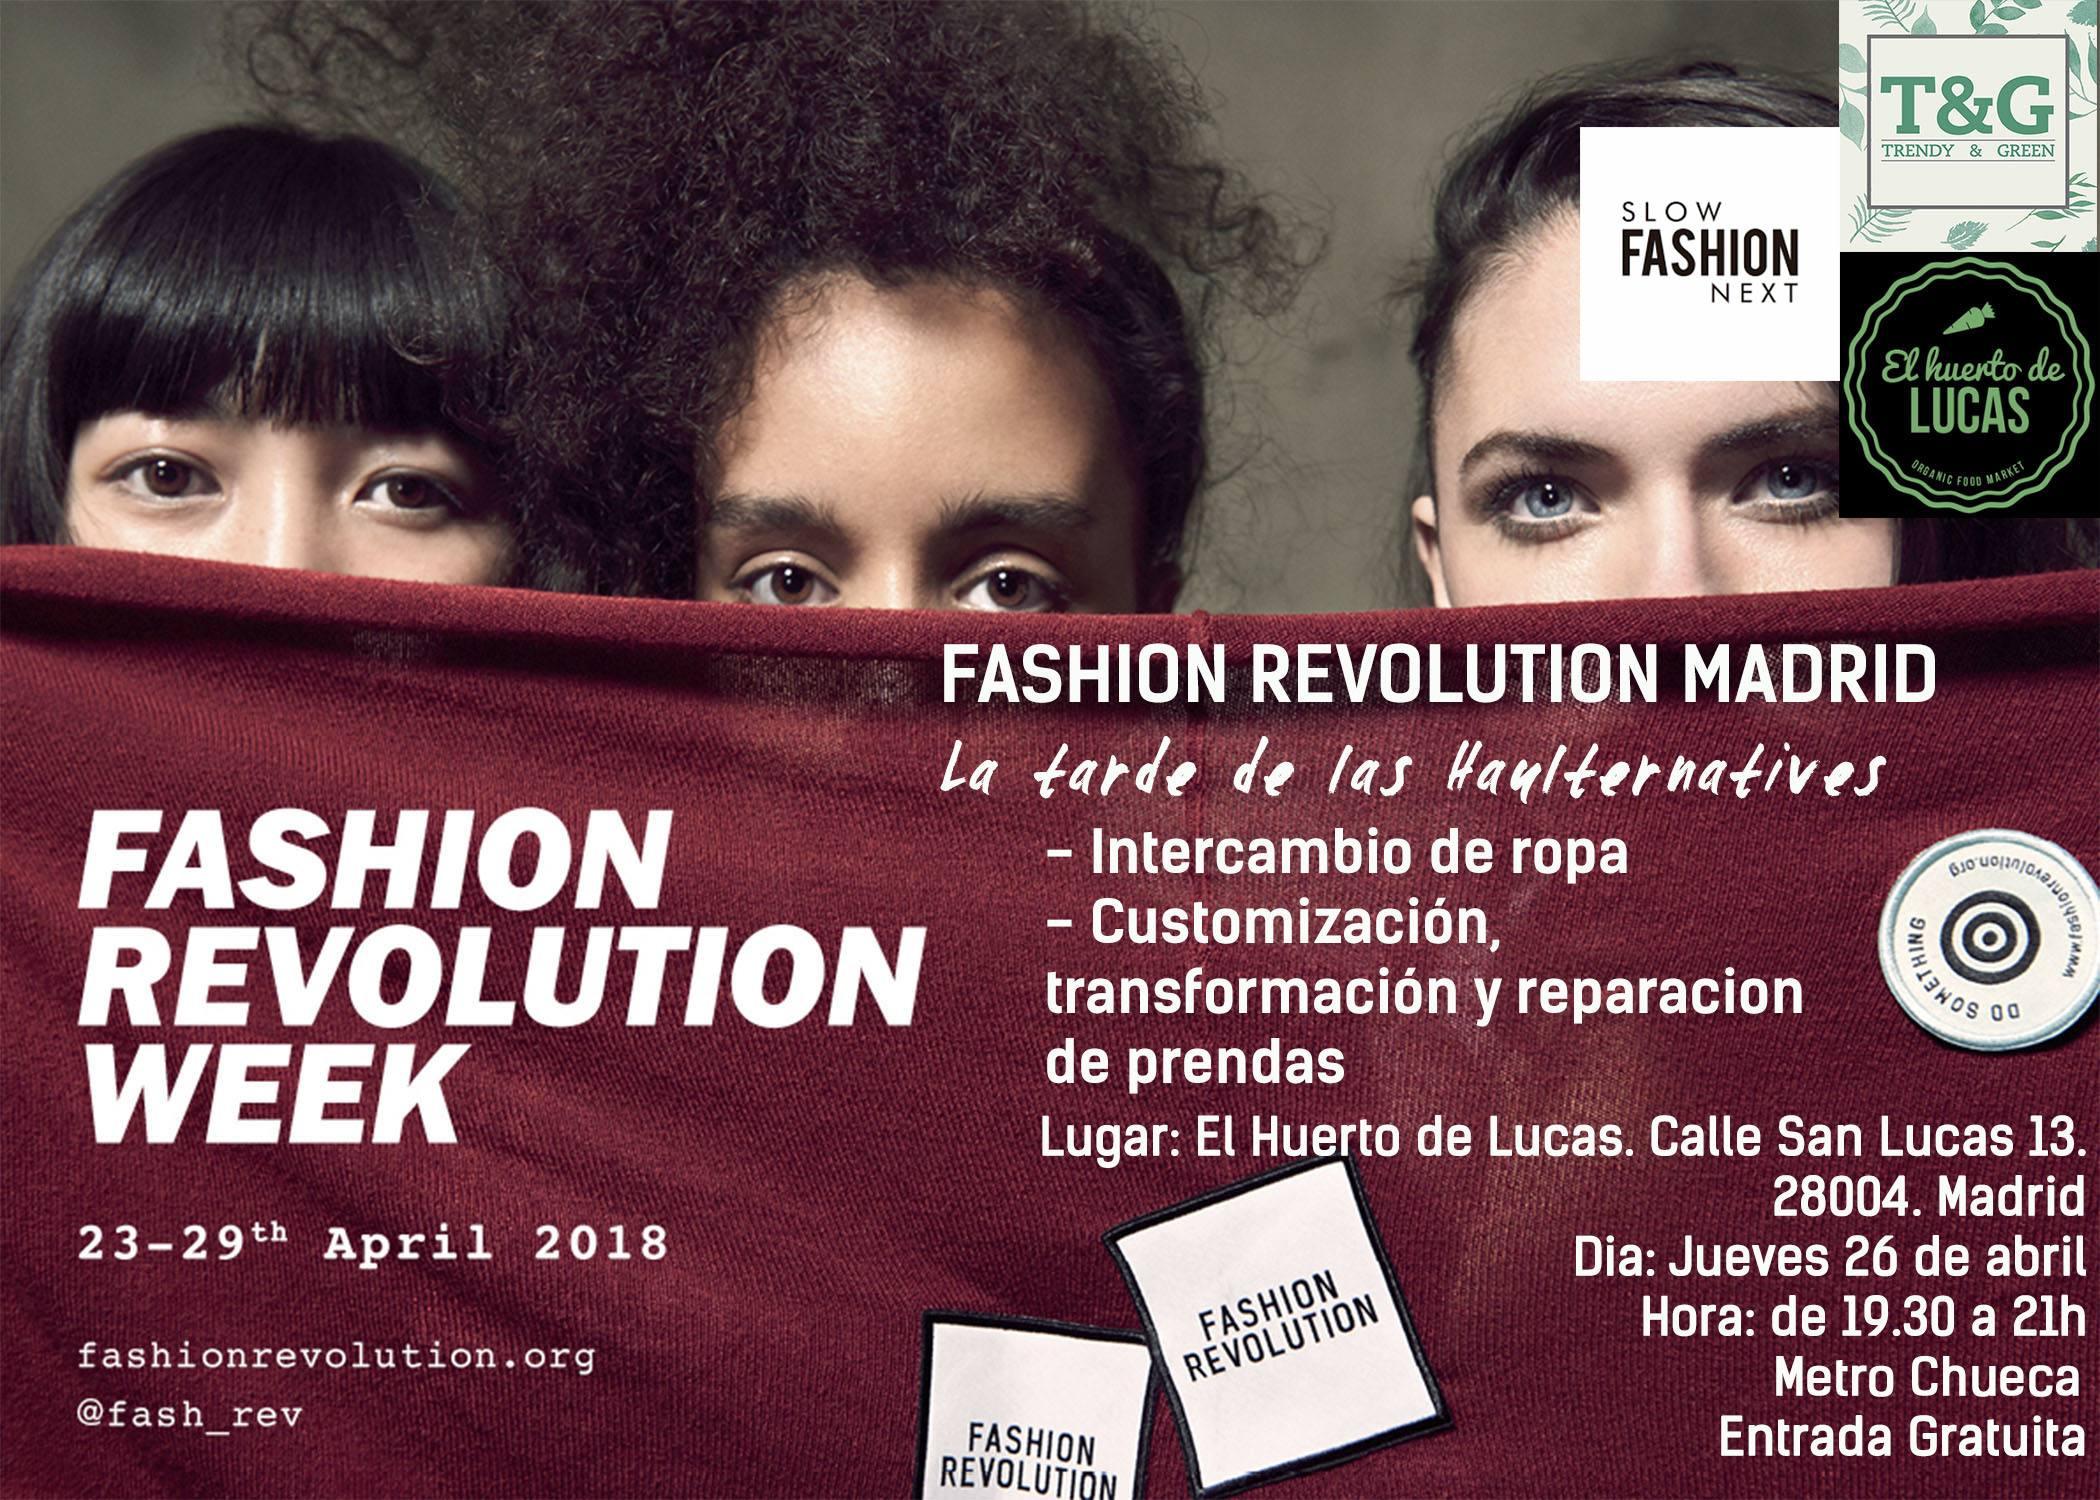 Trendy & Green Cartel Fashion Revolution